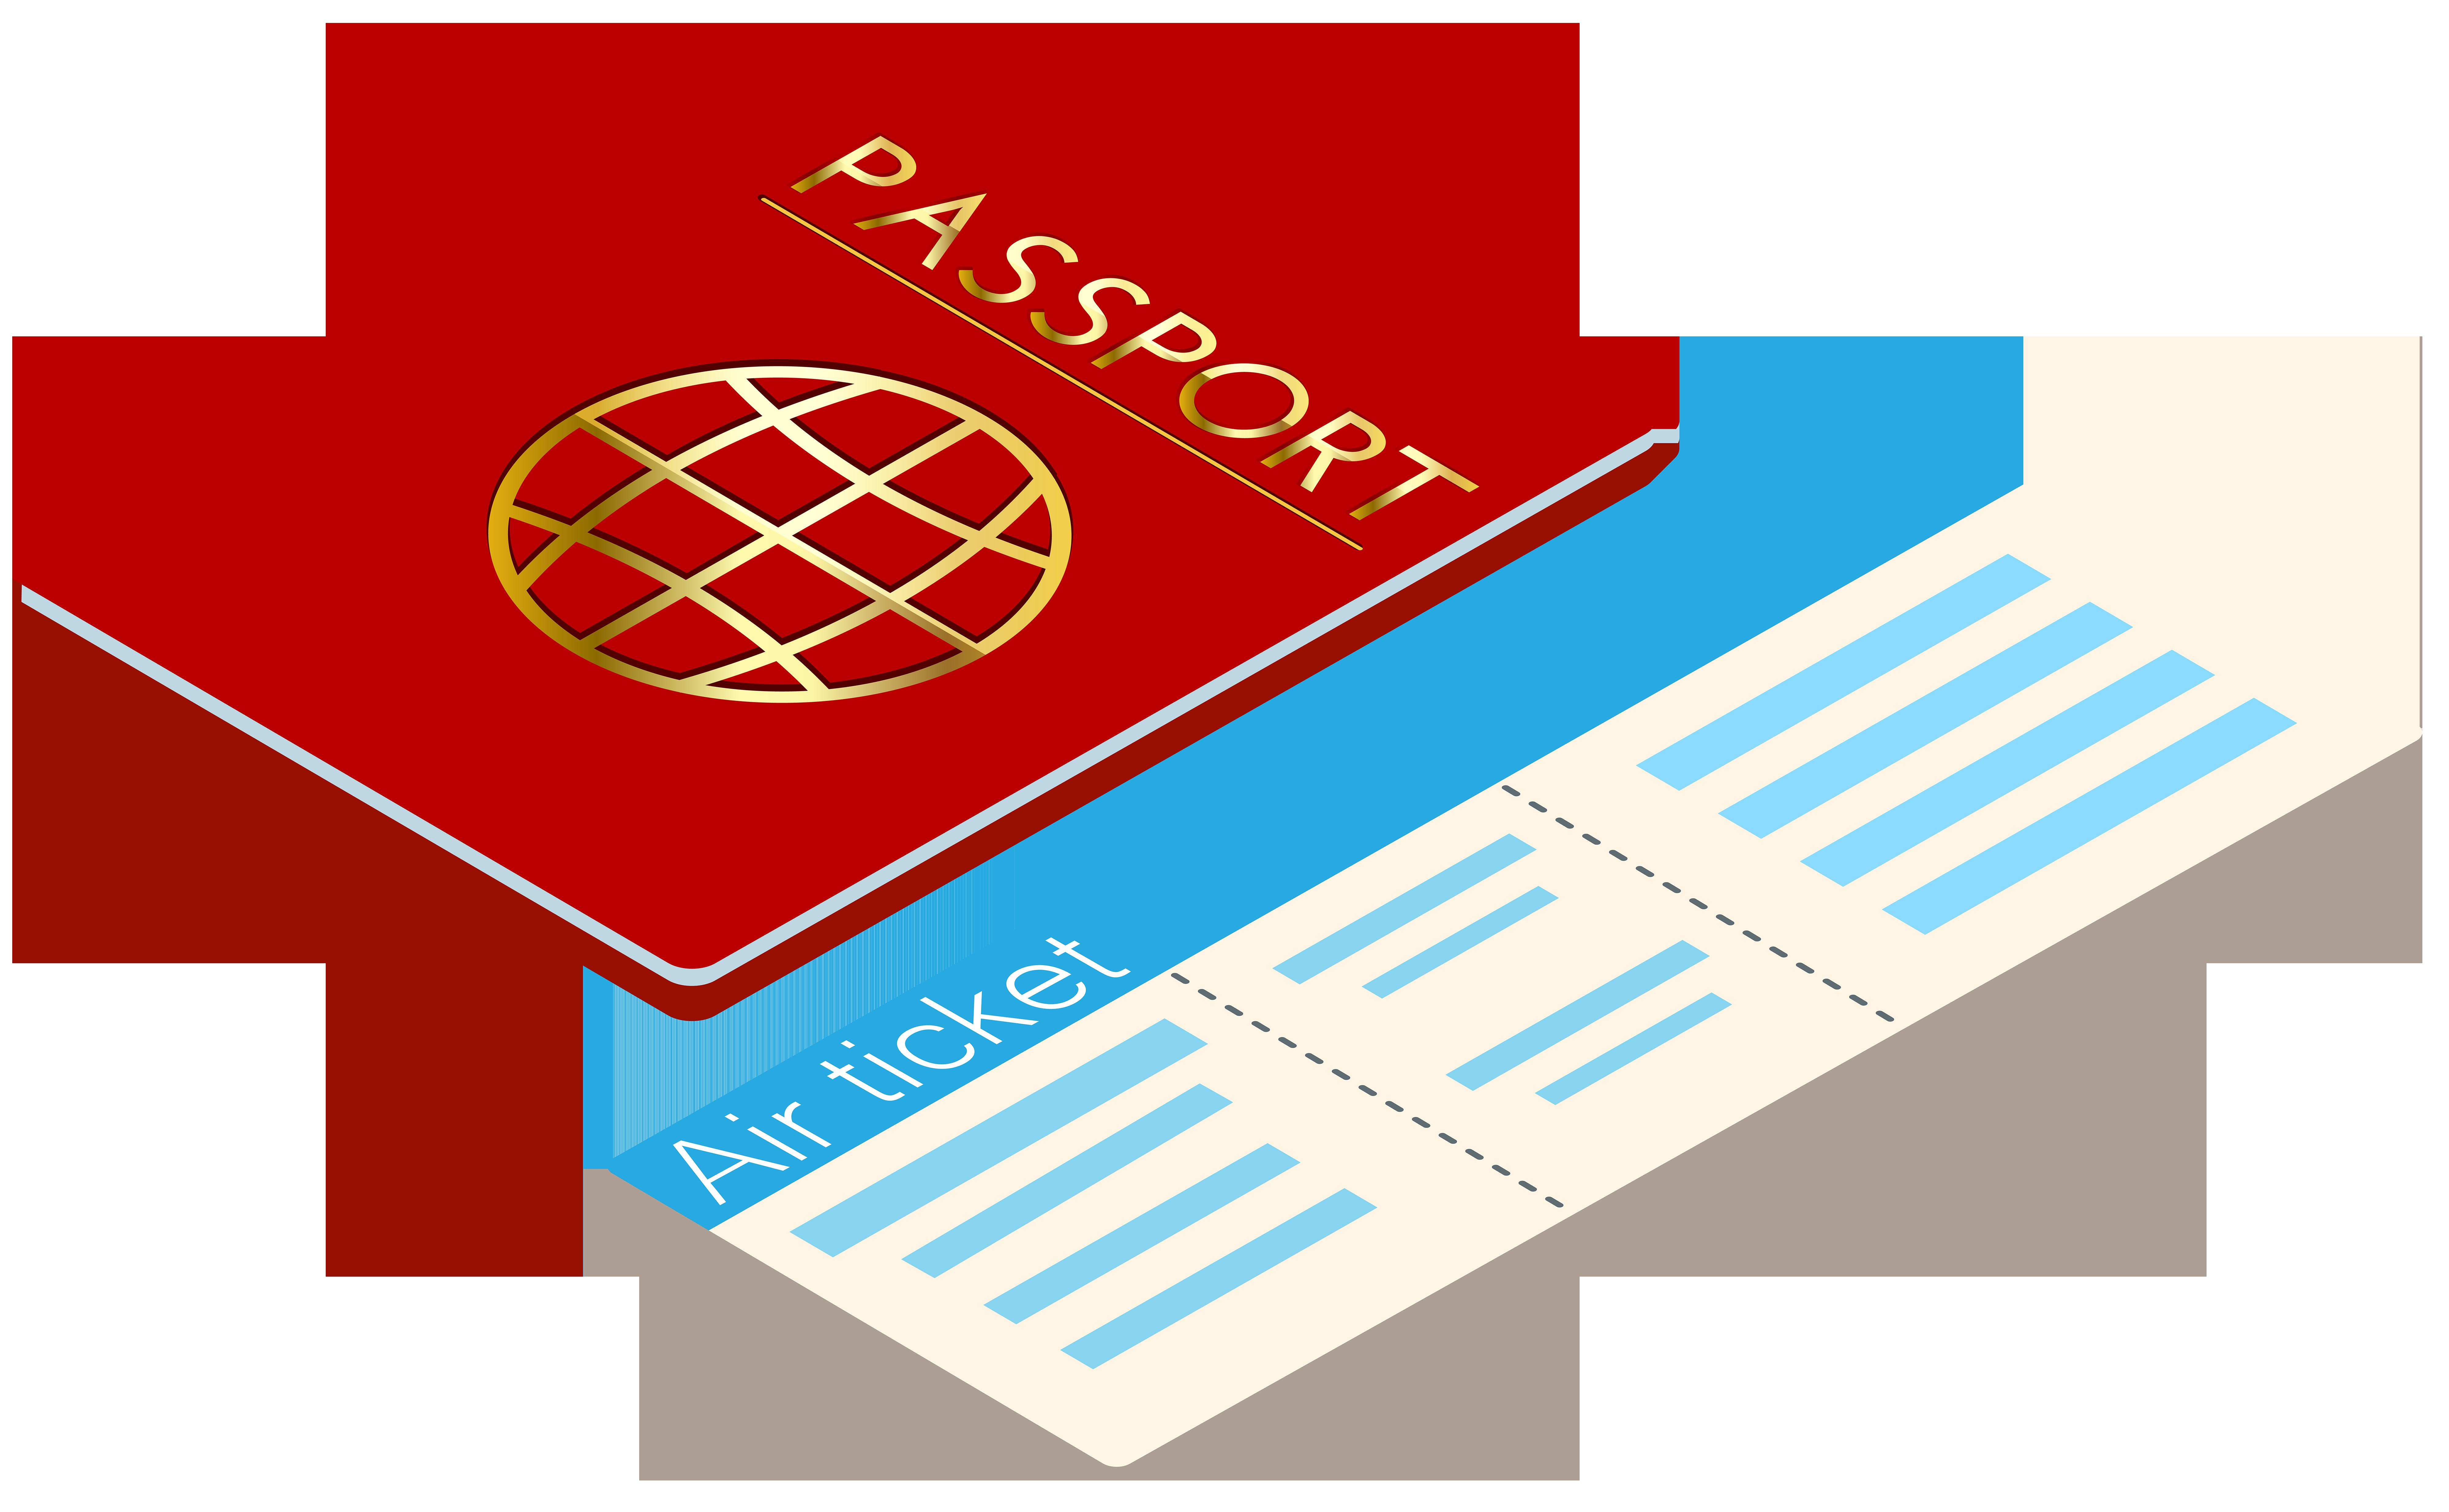 Passport and Ticket Transparent Clip Art.